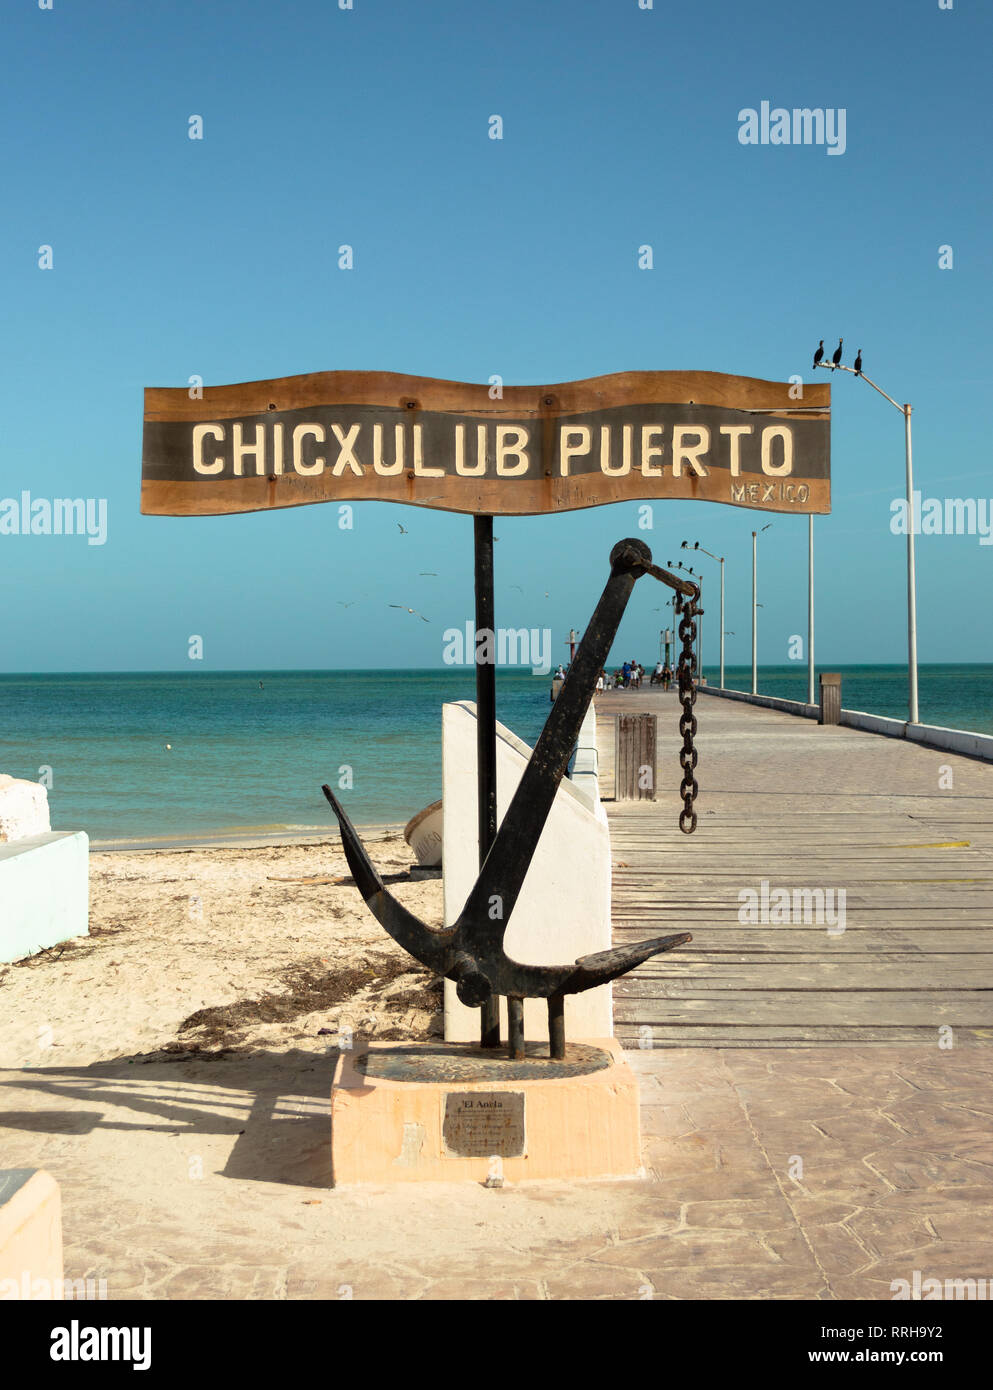 Chicxulub sign on the pier. Yucatan, Mexico. - Stock Image